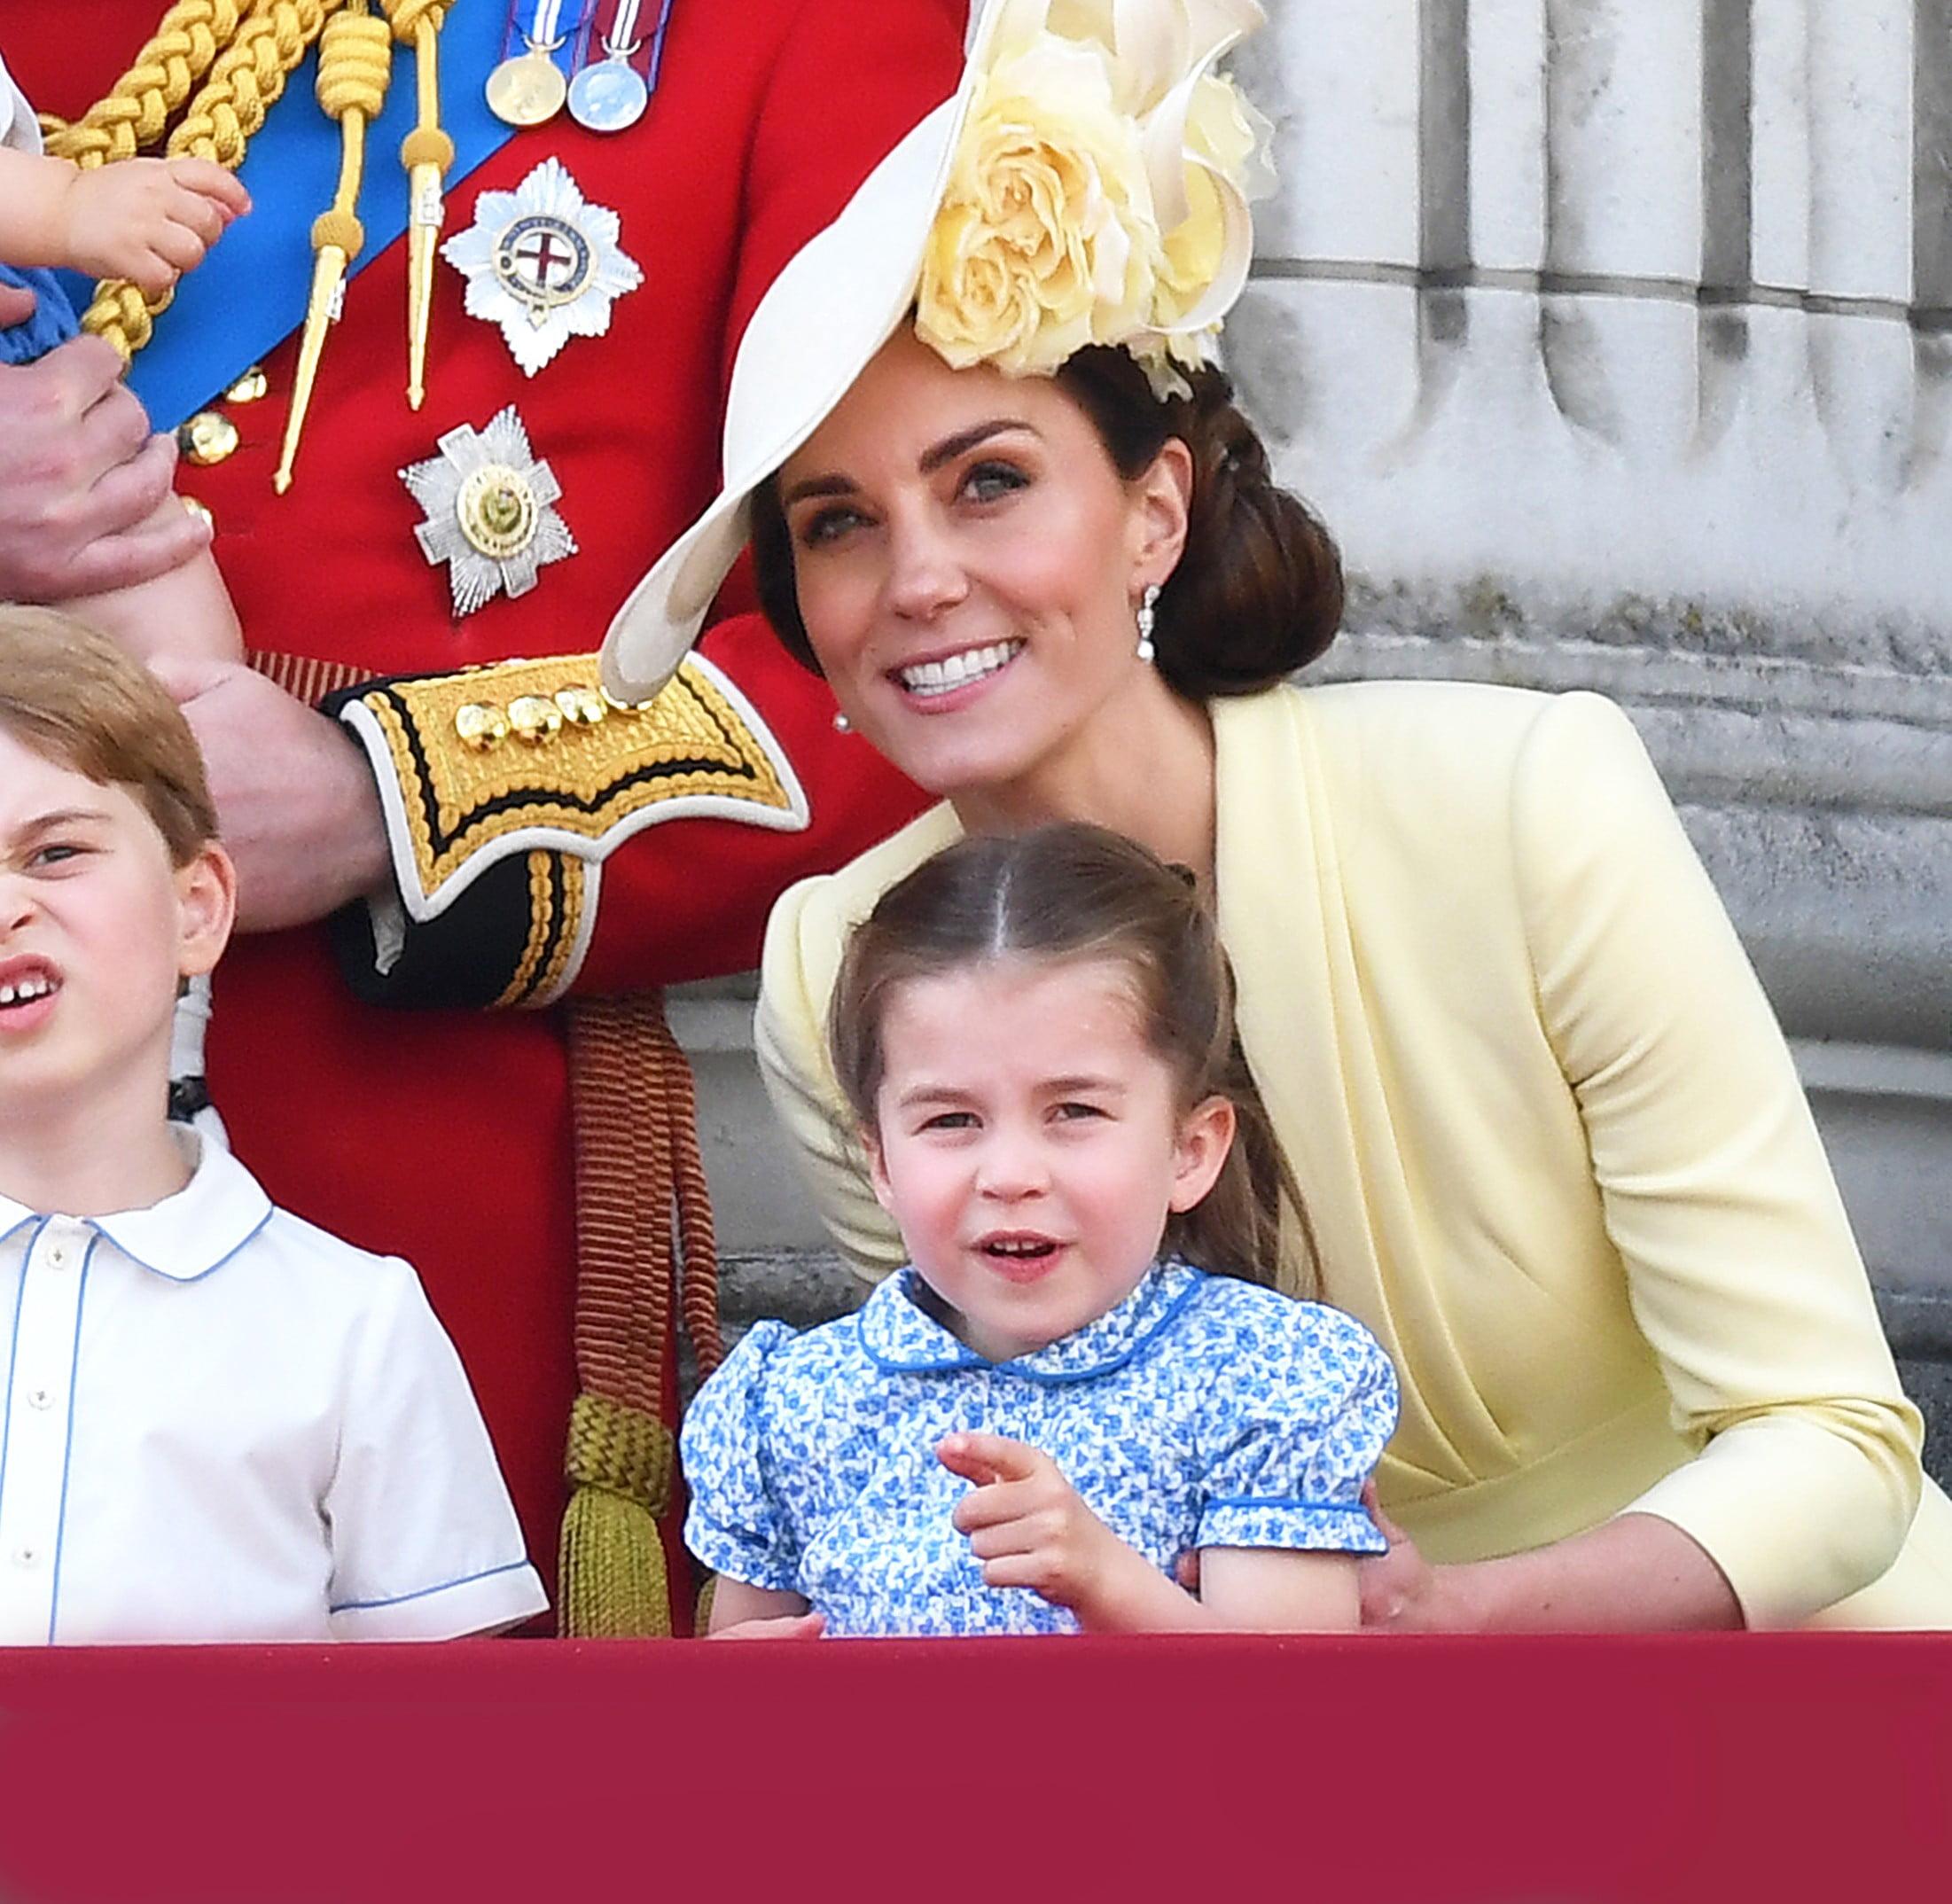 Duchess Kate Shares Precious Photo of Princess Charlotte on Her Birthday